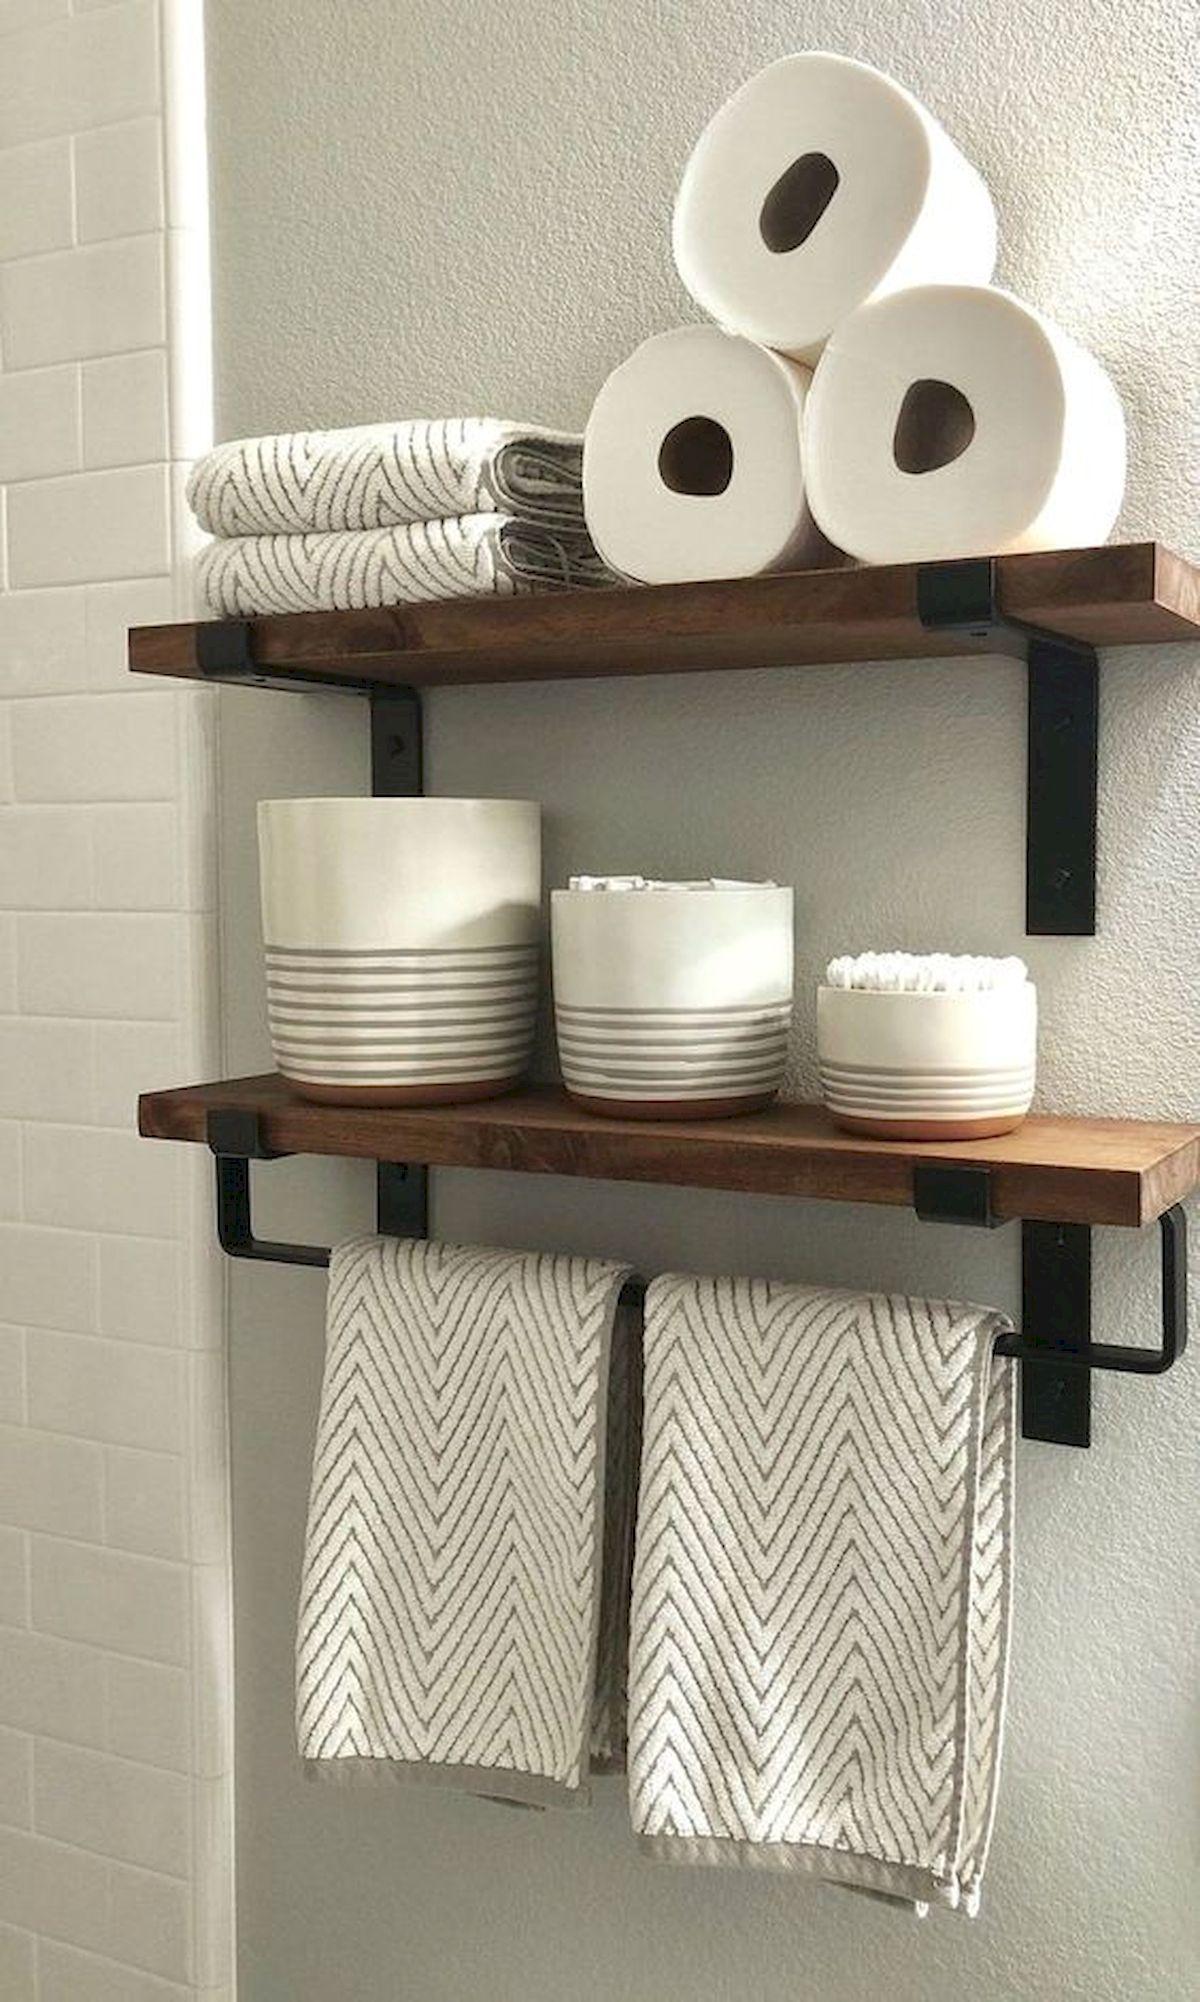 50 Stunning DIY Home Decor Ideas Dollar Store (53)